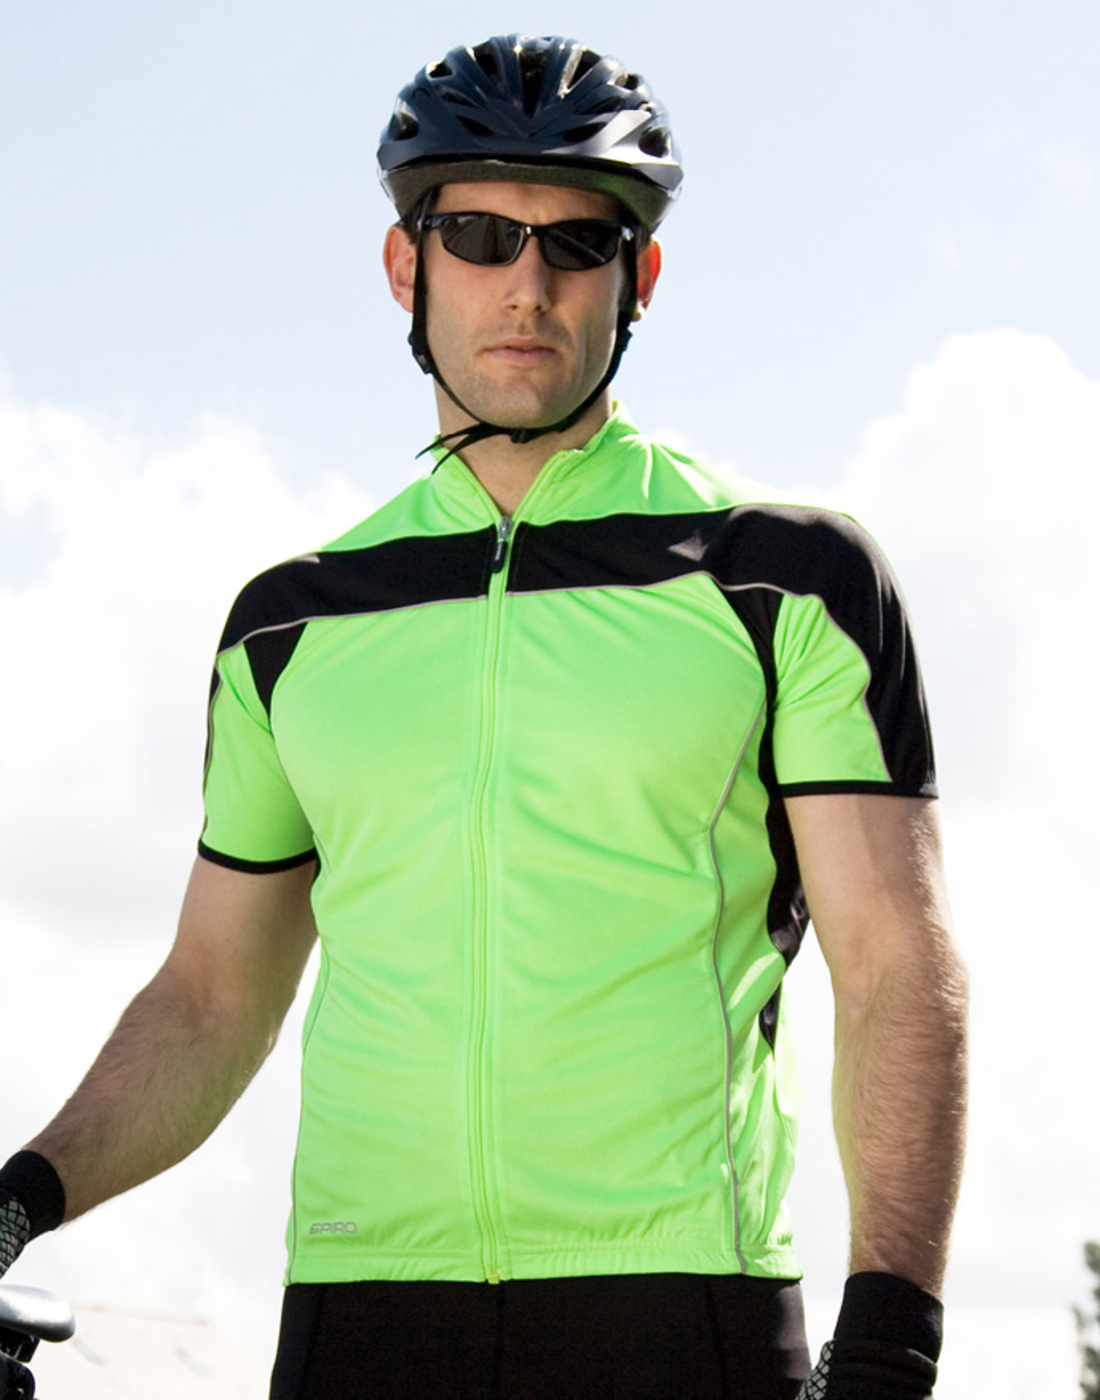 df5c83019 Spiro Spiro Bikewear Full Zip Top - All Seasons Sport   Leisurewear